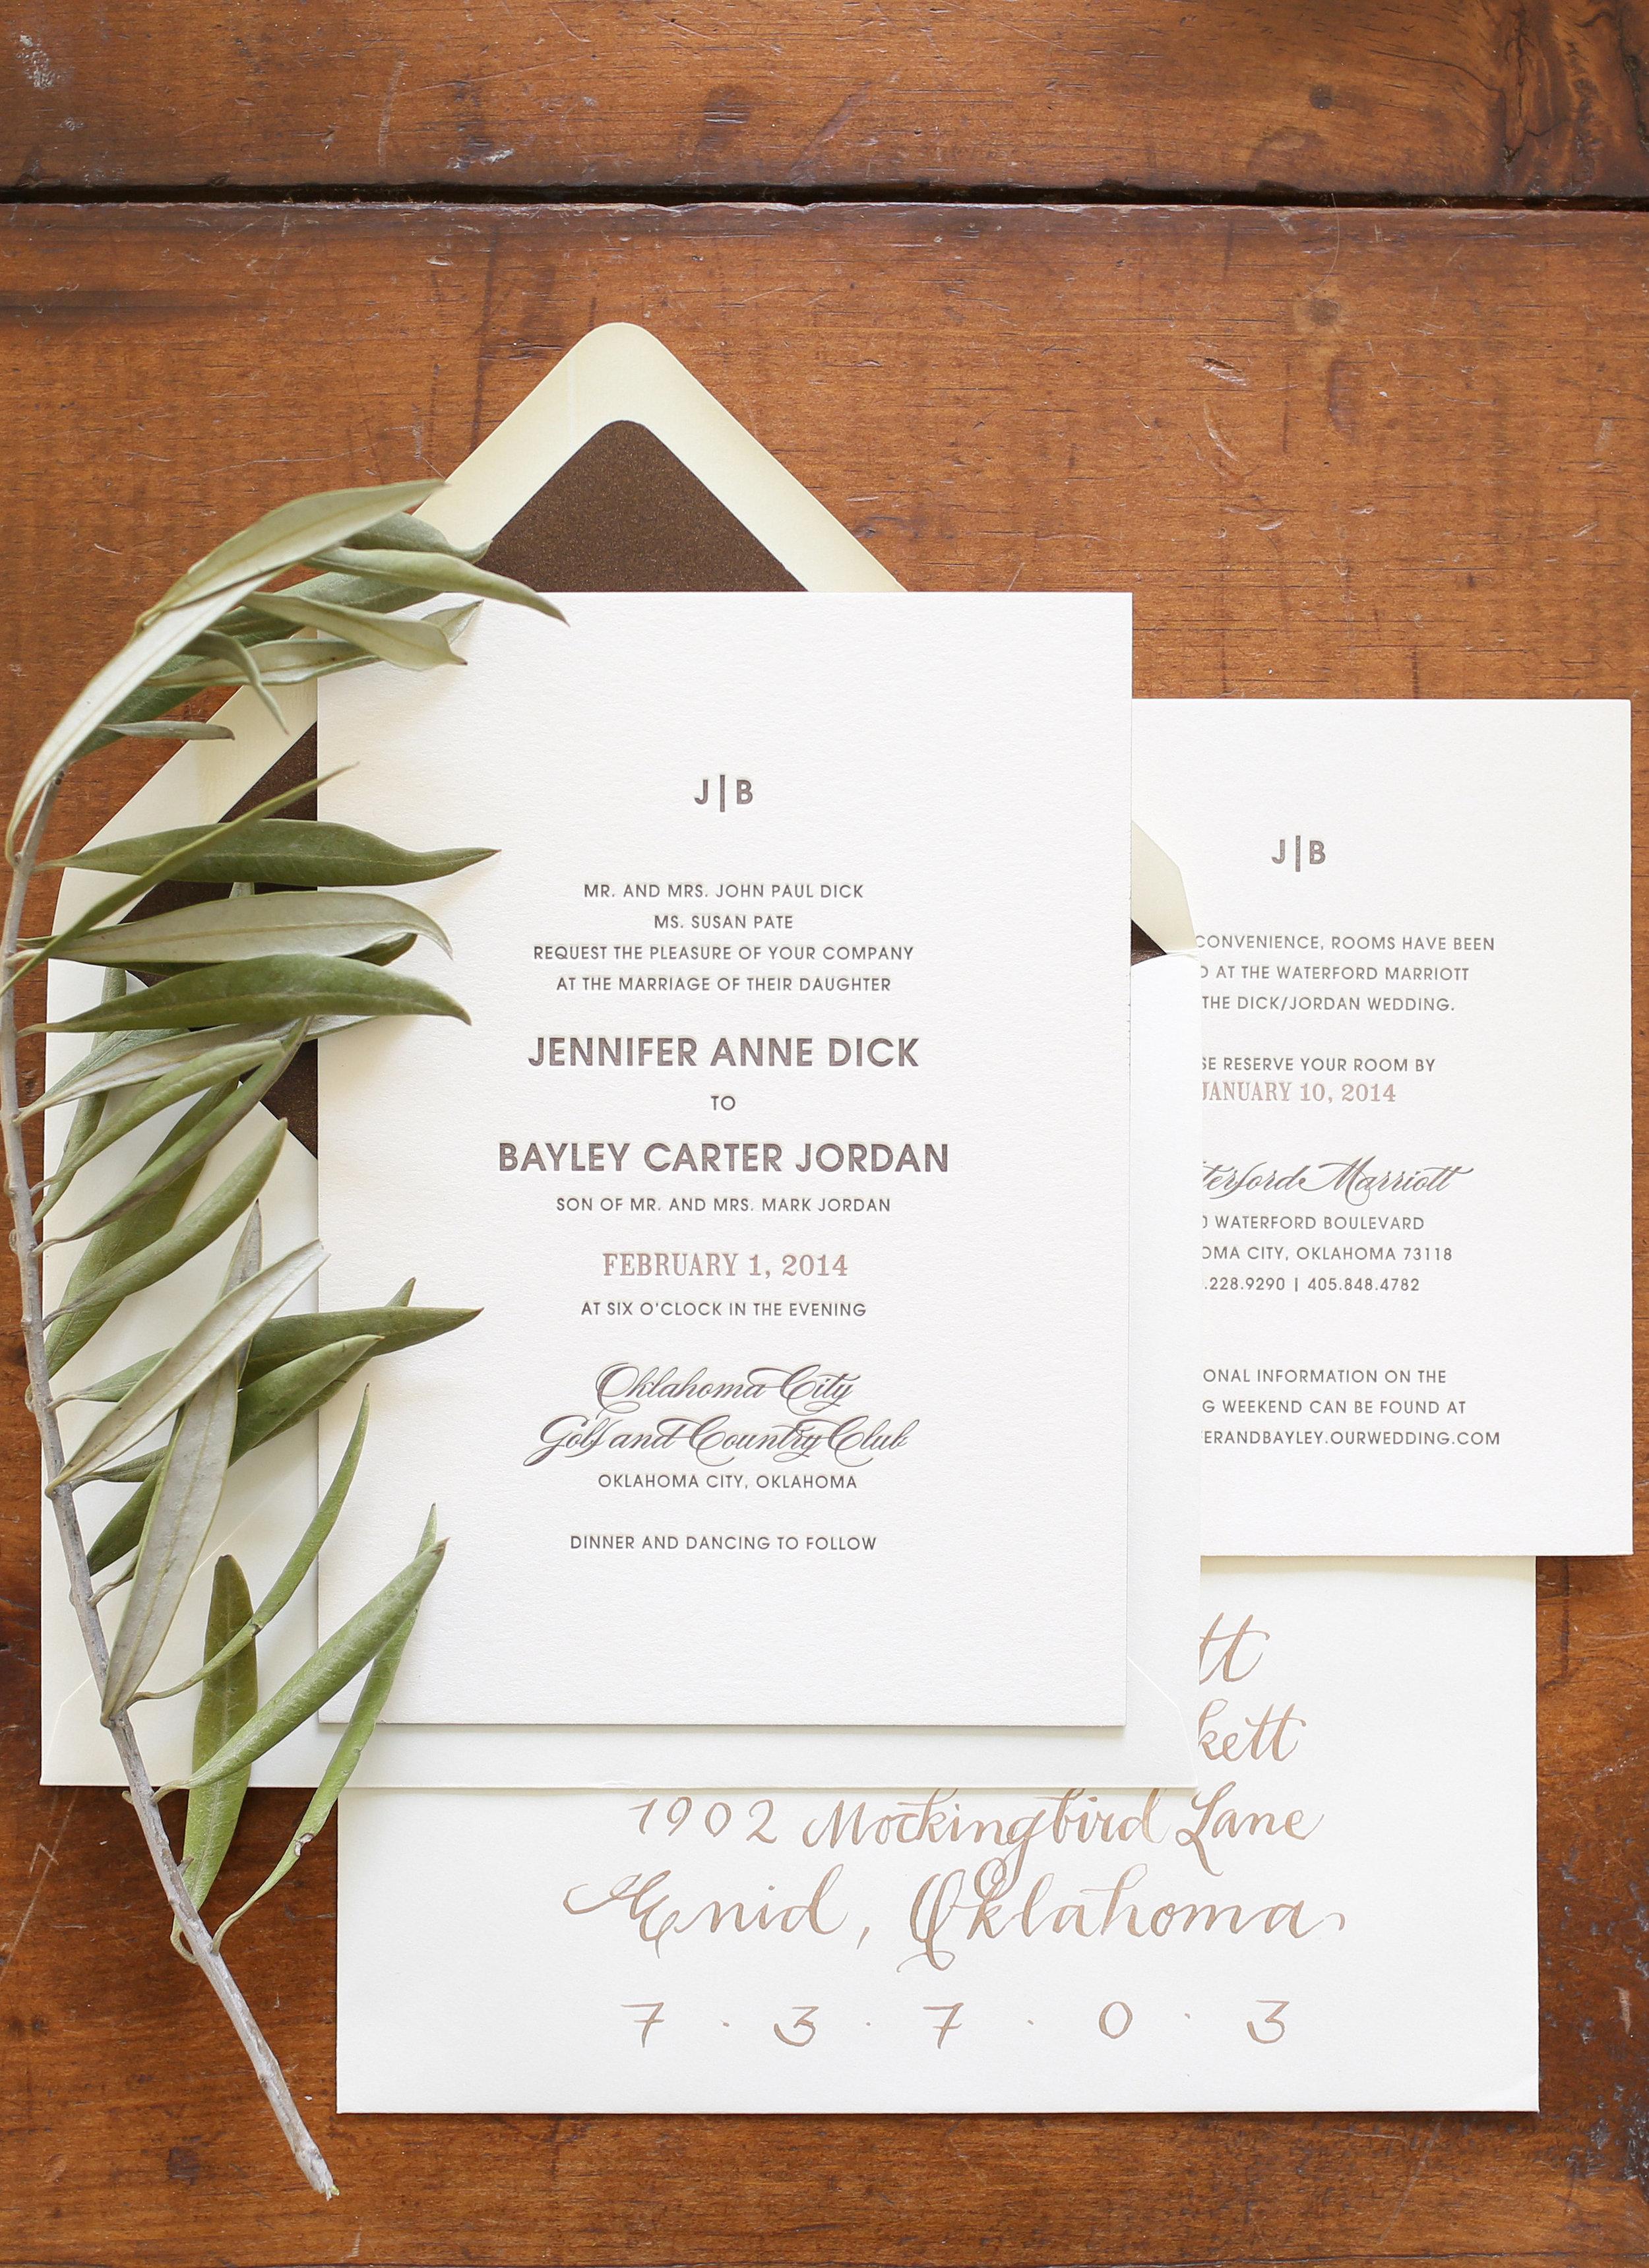 Aaron_Snow_Photography_Dick-Jordan_Wedding_Invitations.010.jpg